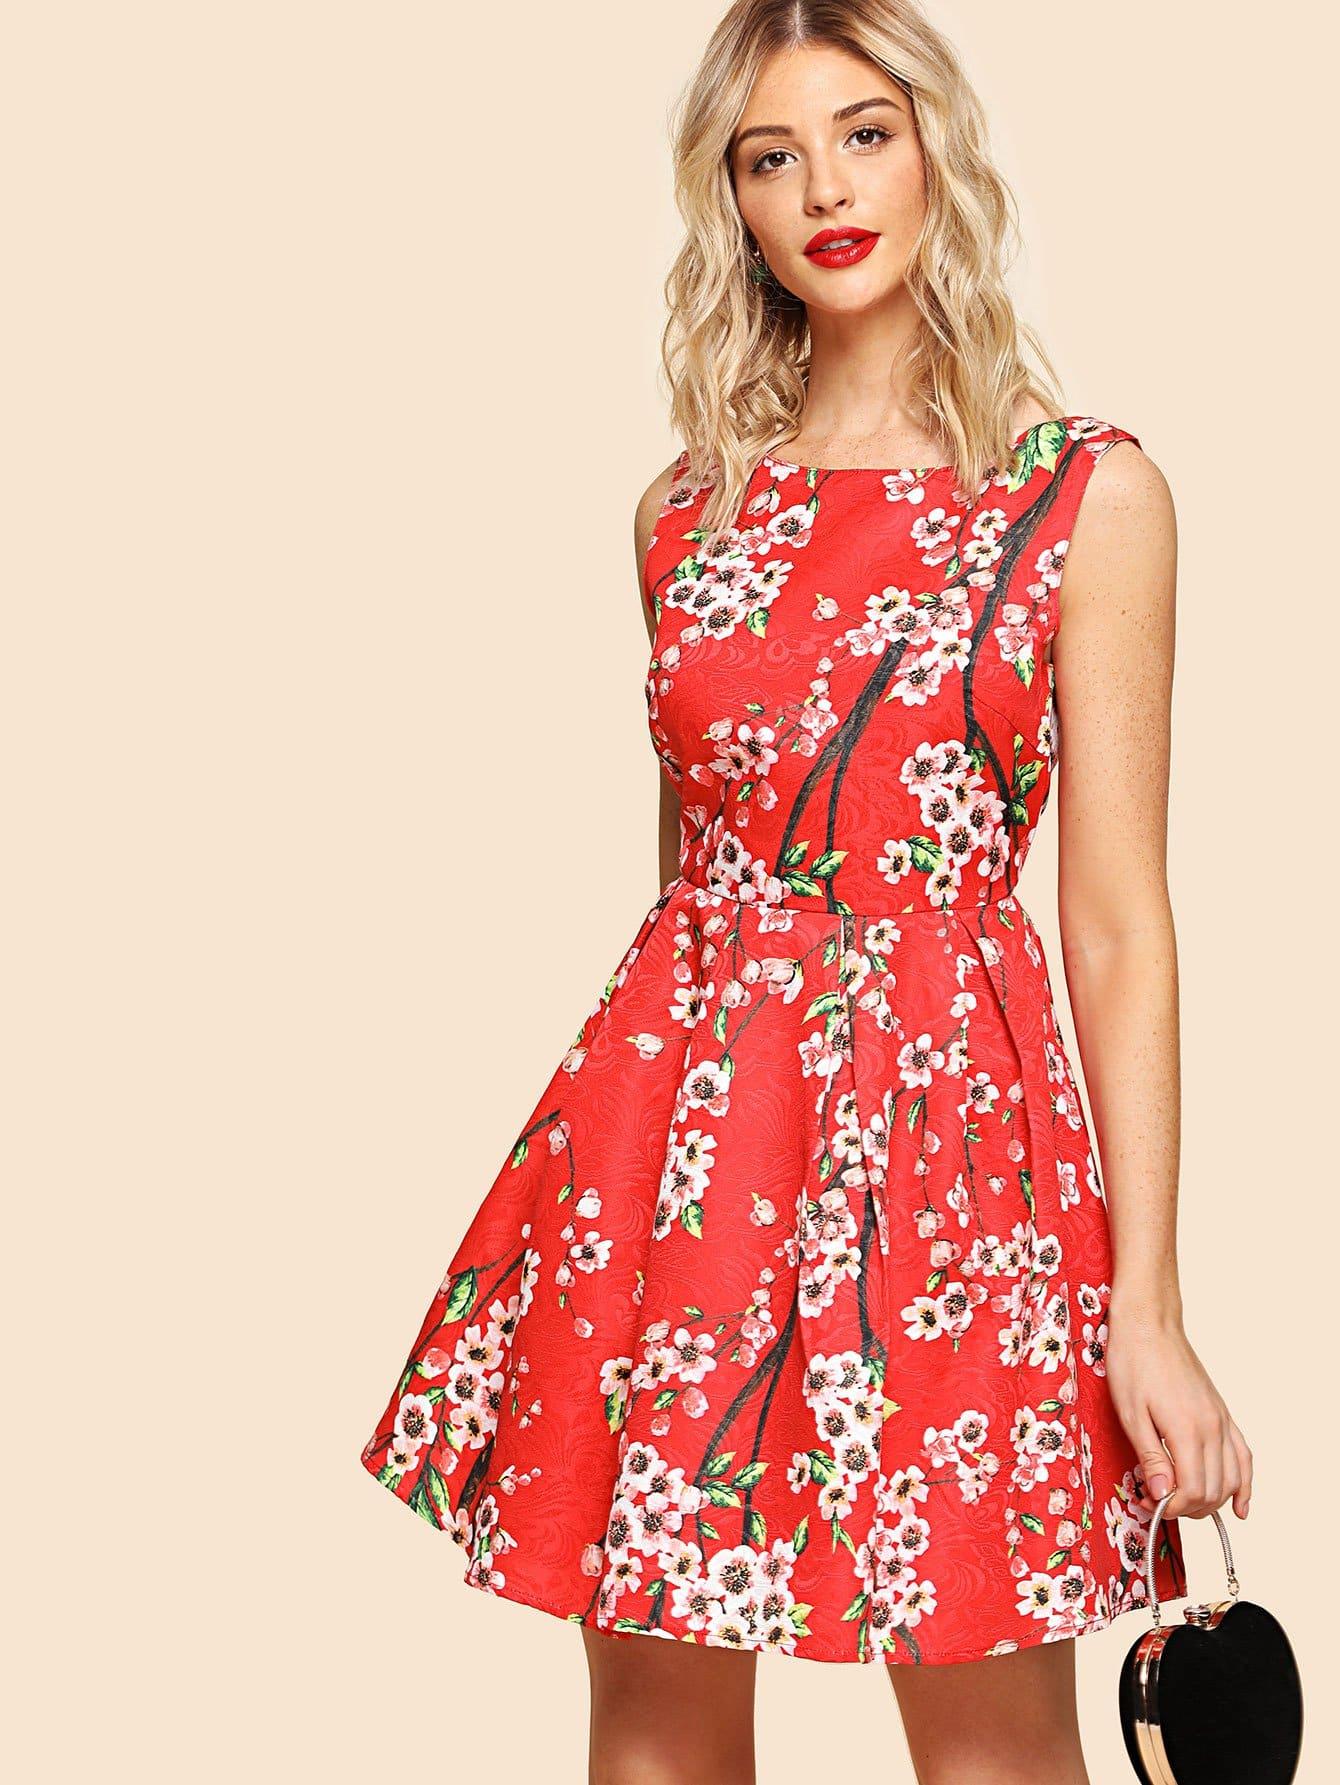 Flower Blossom Print Box Pleated Dress flower print box pleated skirt